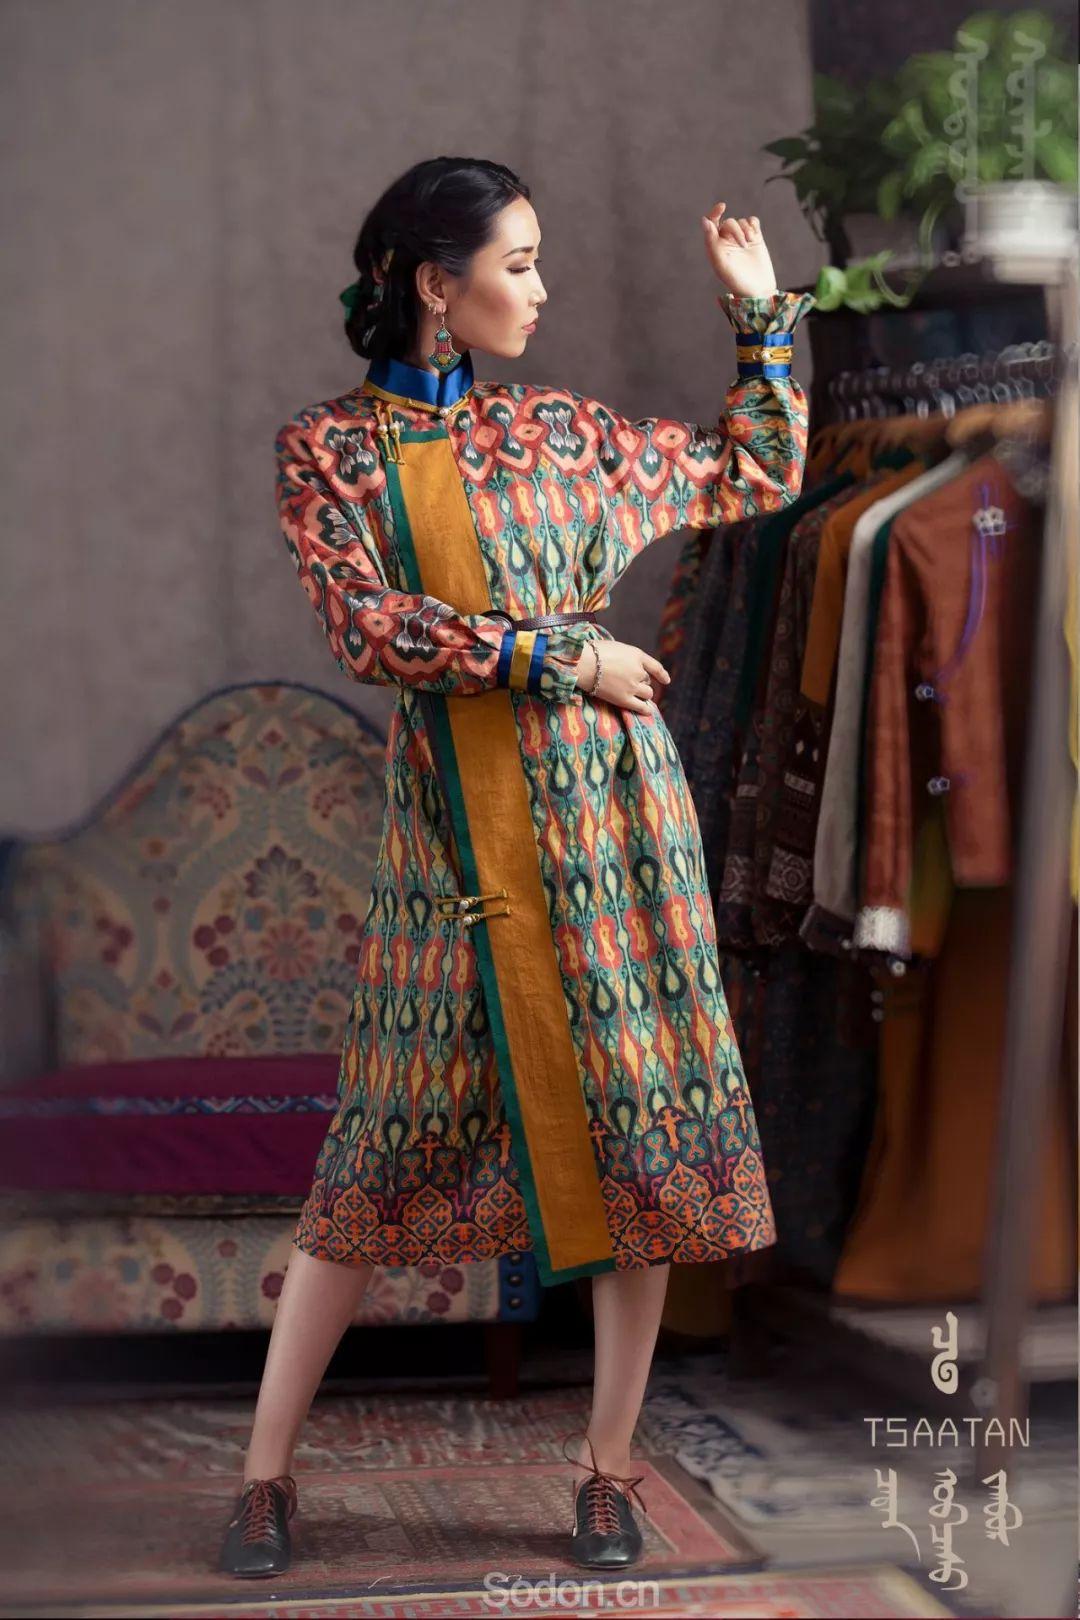 TSAATAN蒙古时装秋冬系列,来自驯鹿人的独特魅力! 第30张